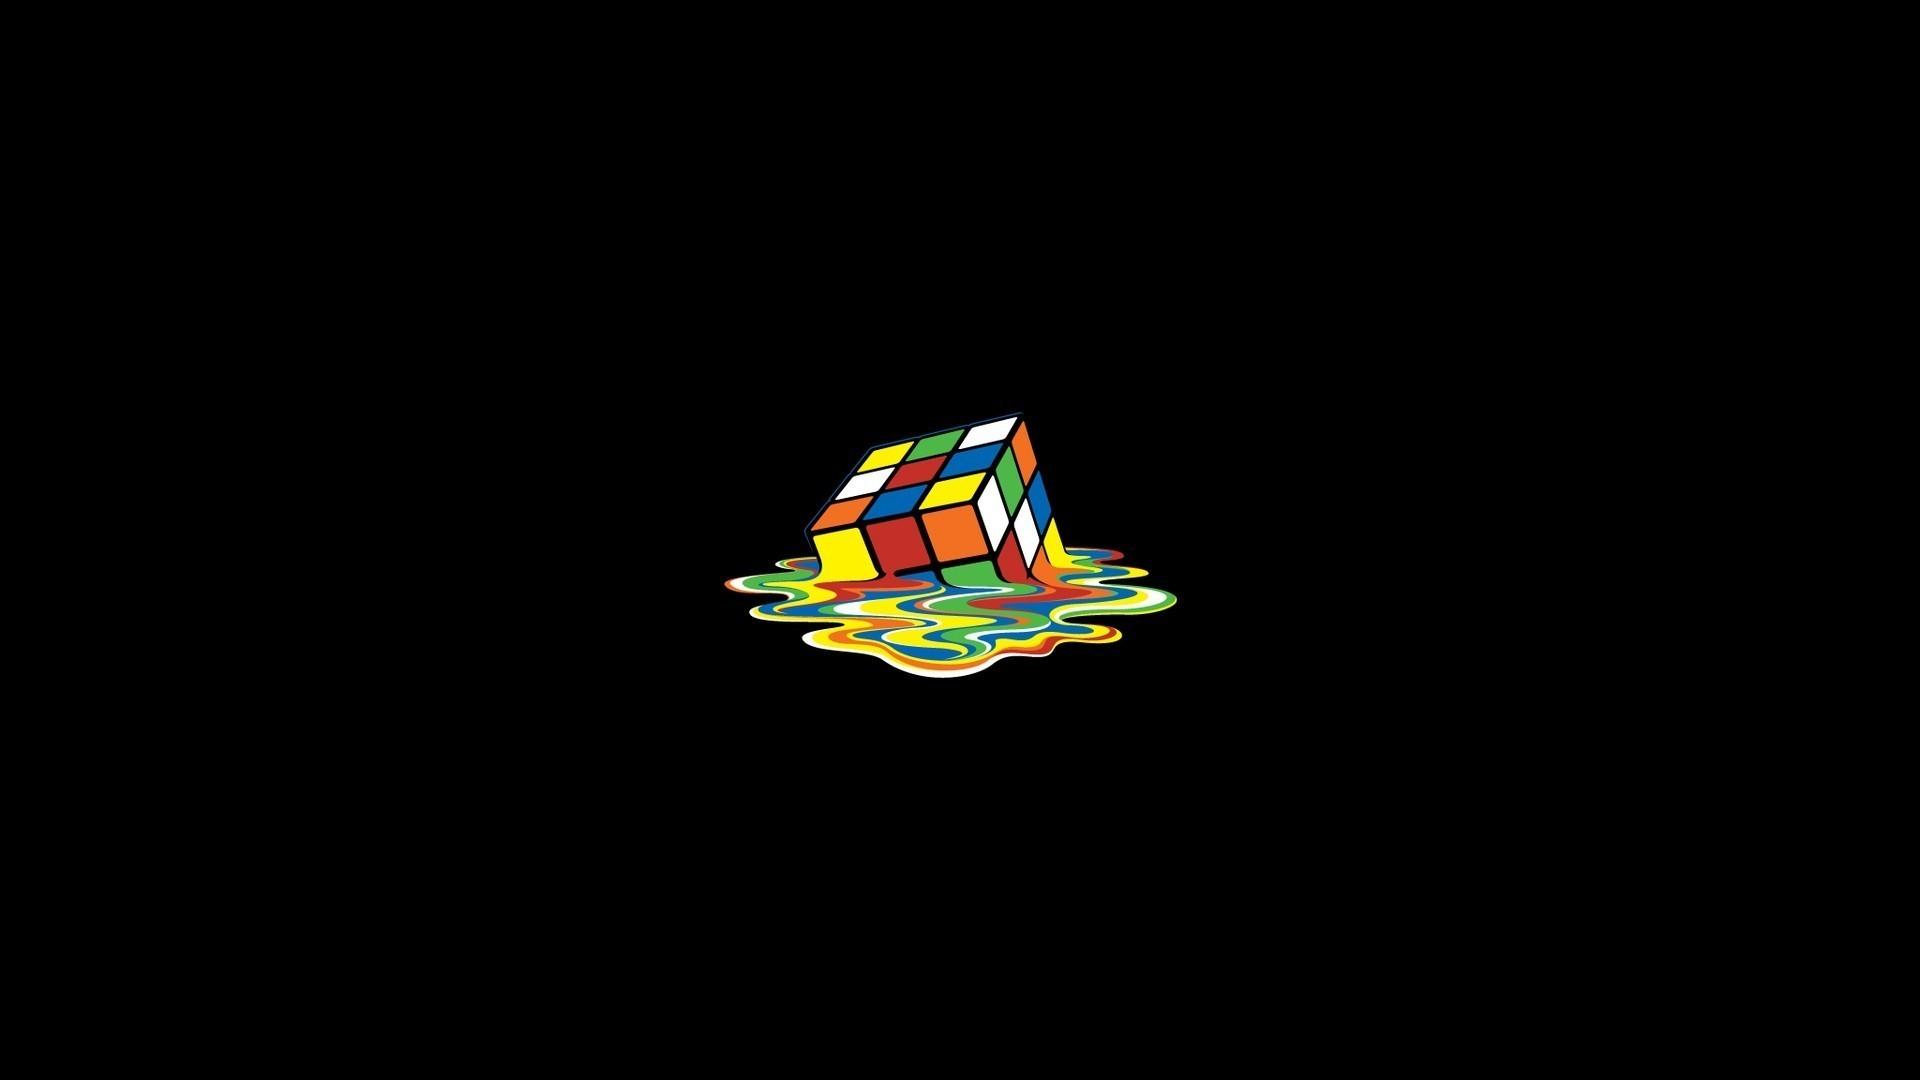 HD Wallpaper Wallpapers Free Download Molten Rubik Cube 1080p HD